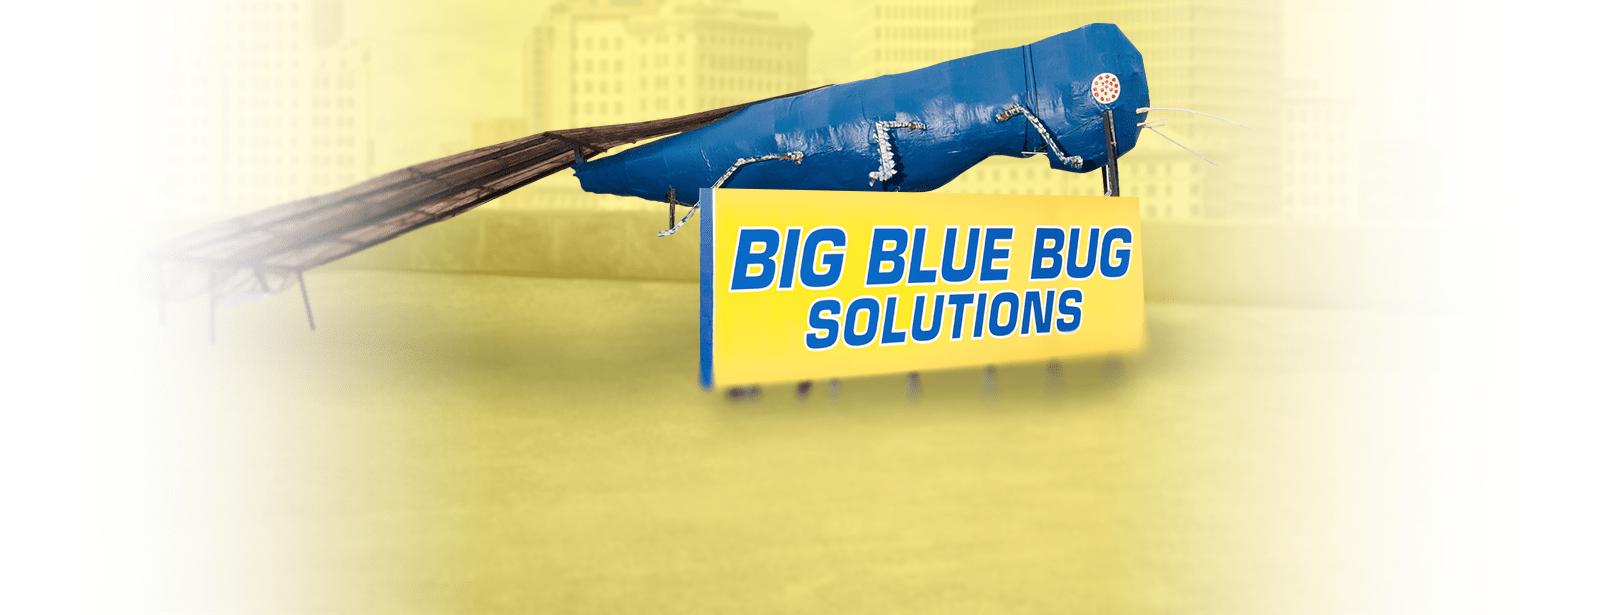 the big blue bug mascot in providence rhode island